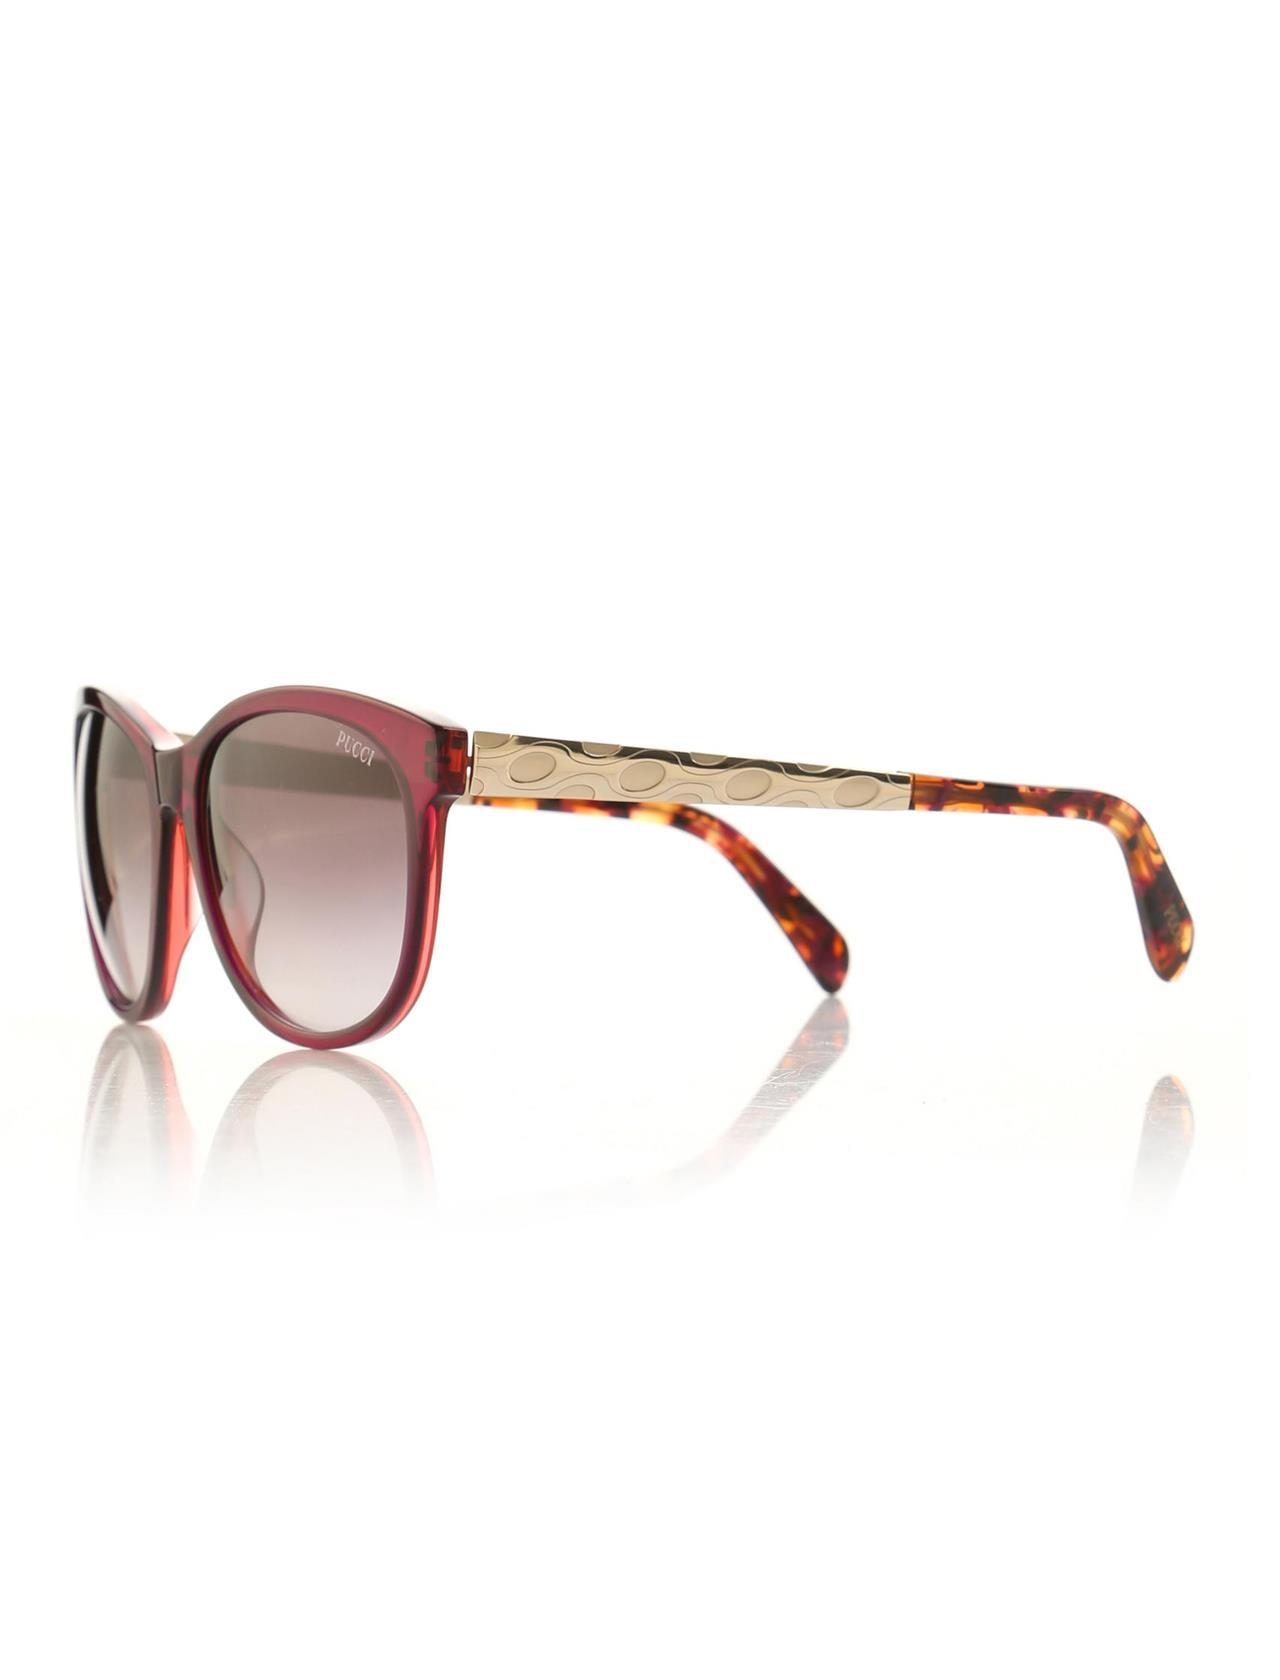 Women's sunglasses ep 0022 71t Bone purple organic rectangle rectangular 57-16-140 emilio pucci